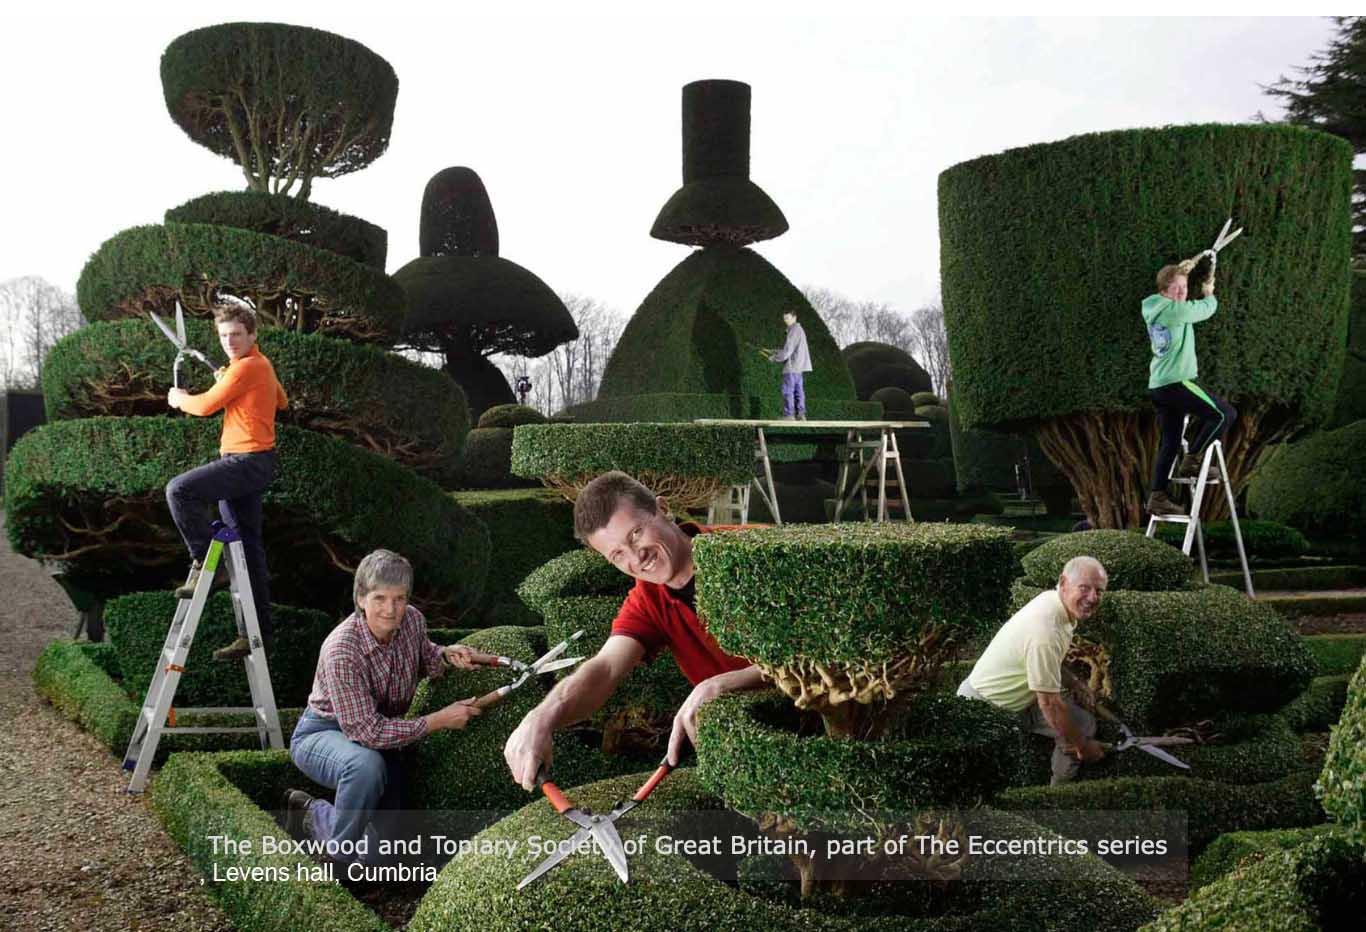 Topiary at Levens hall, Cumbria